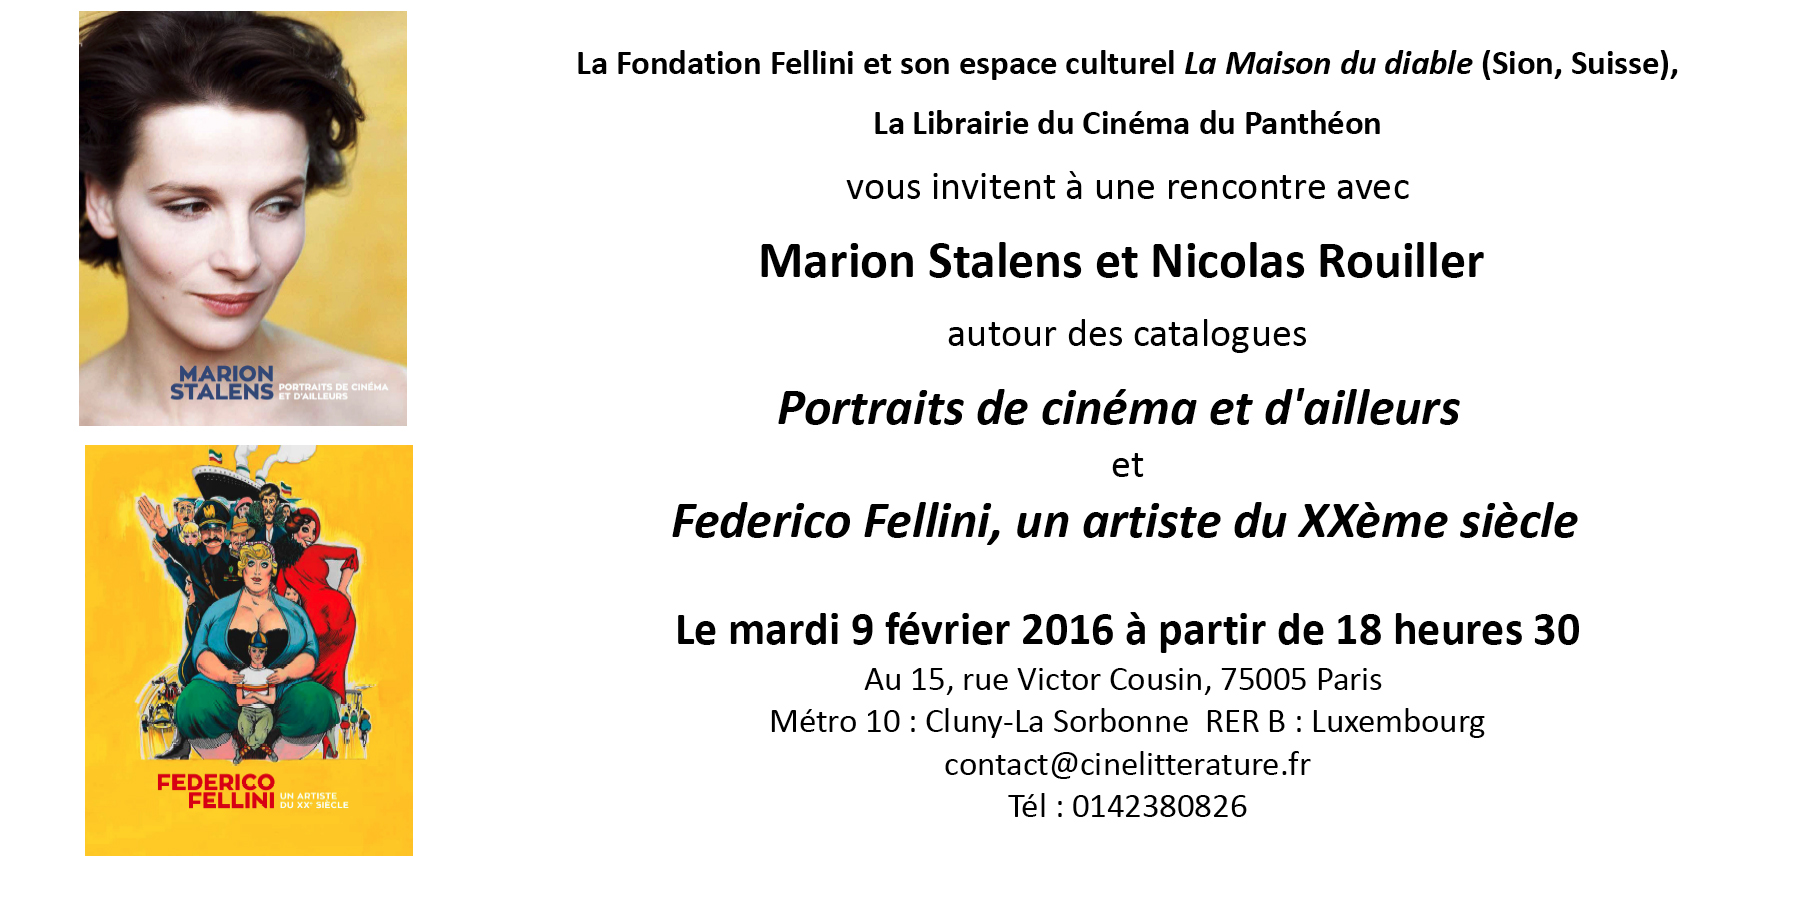 Invitation Librairie Du Cinéma